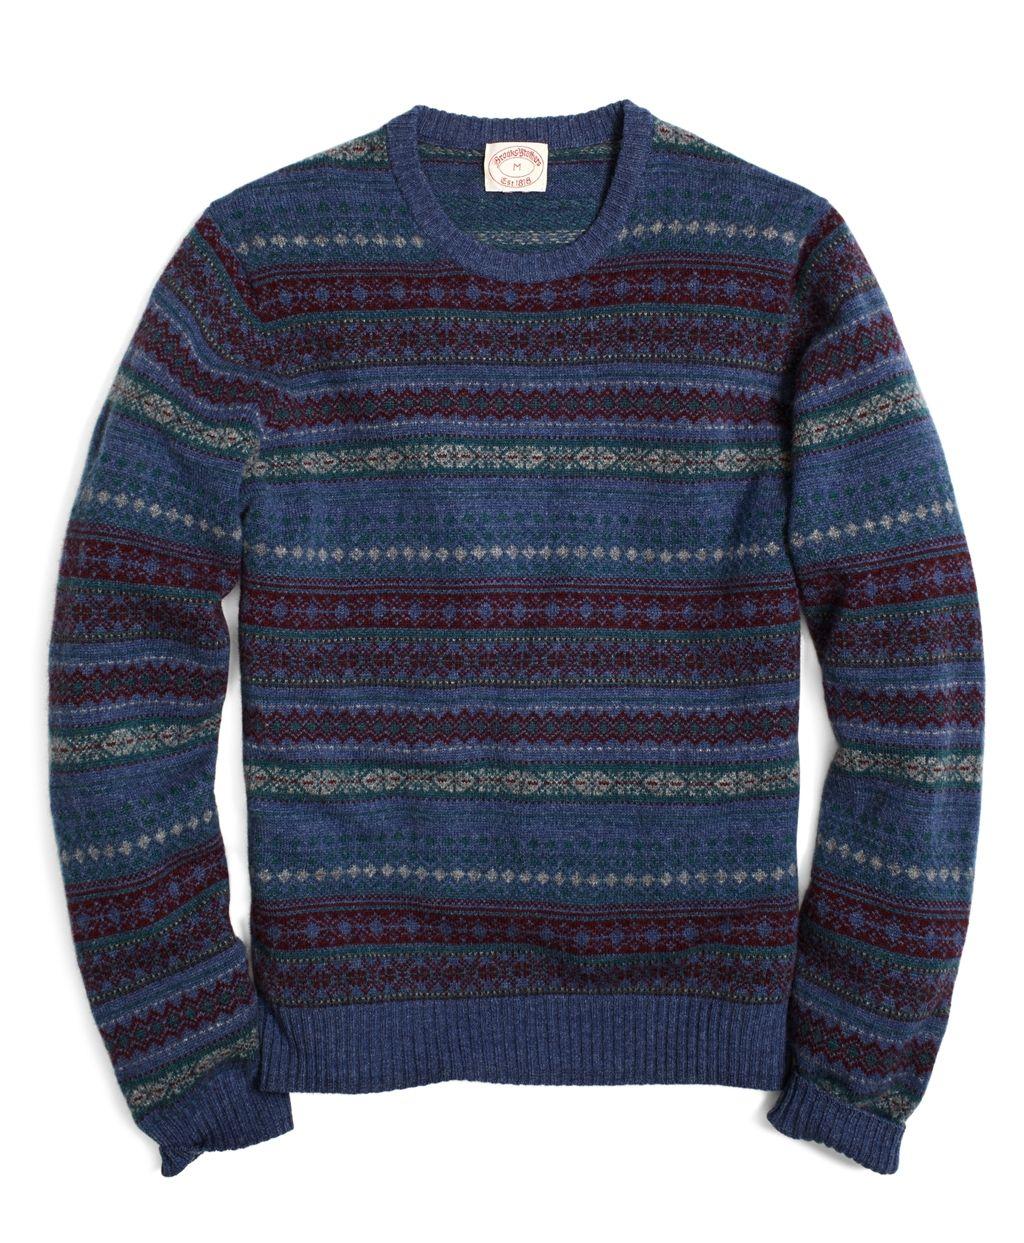 All-Over Fair Isle Crewneck Sweater - Brooks Brothers | gear ...